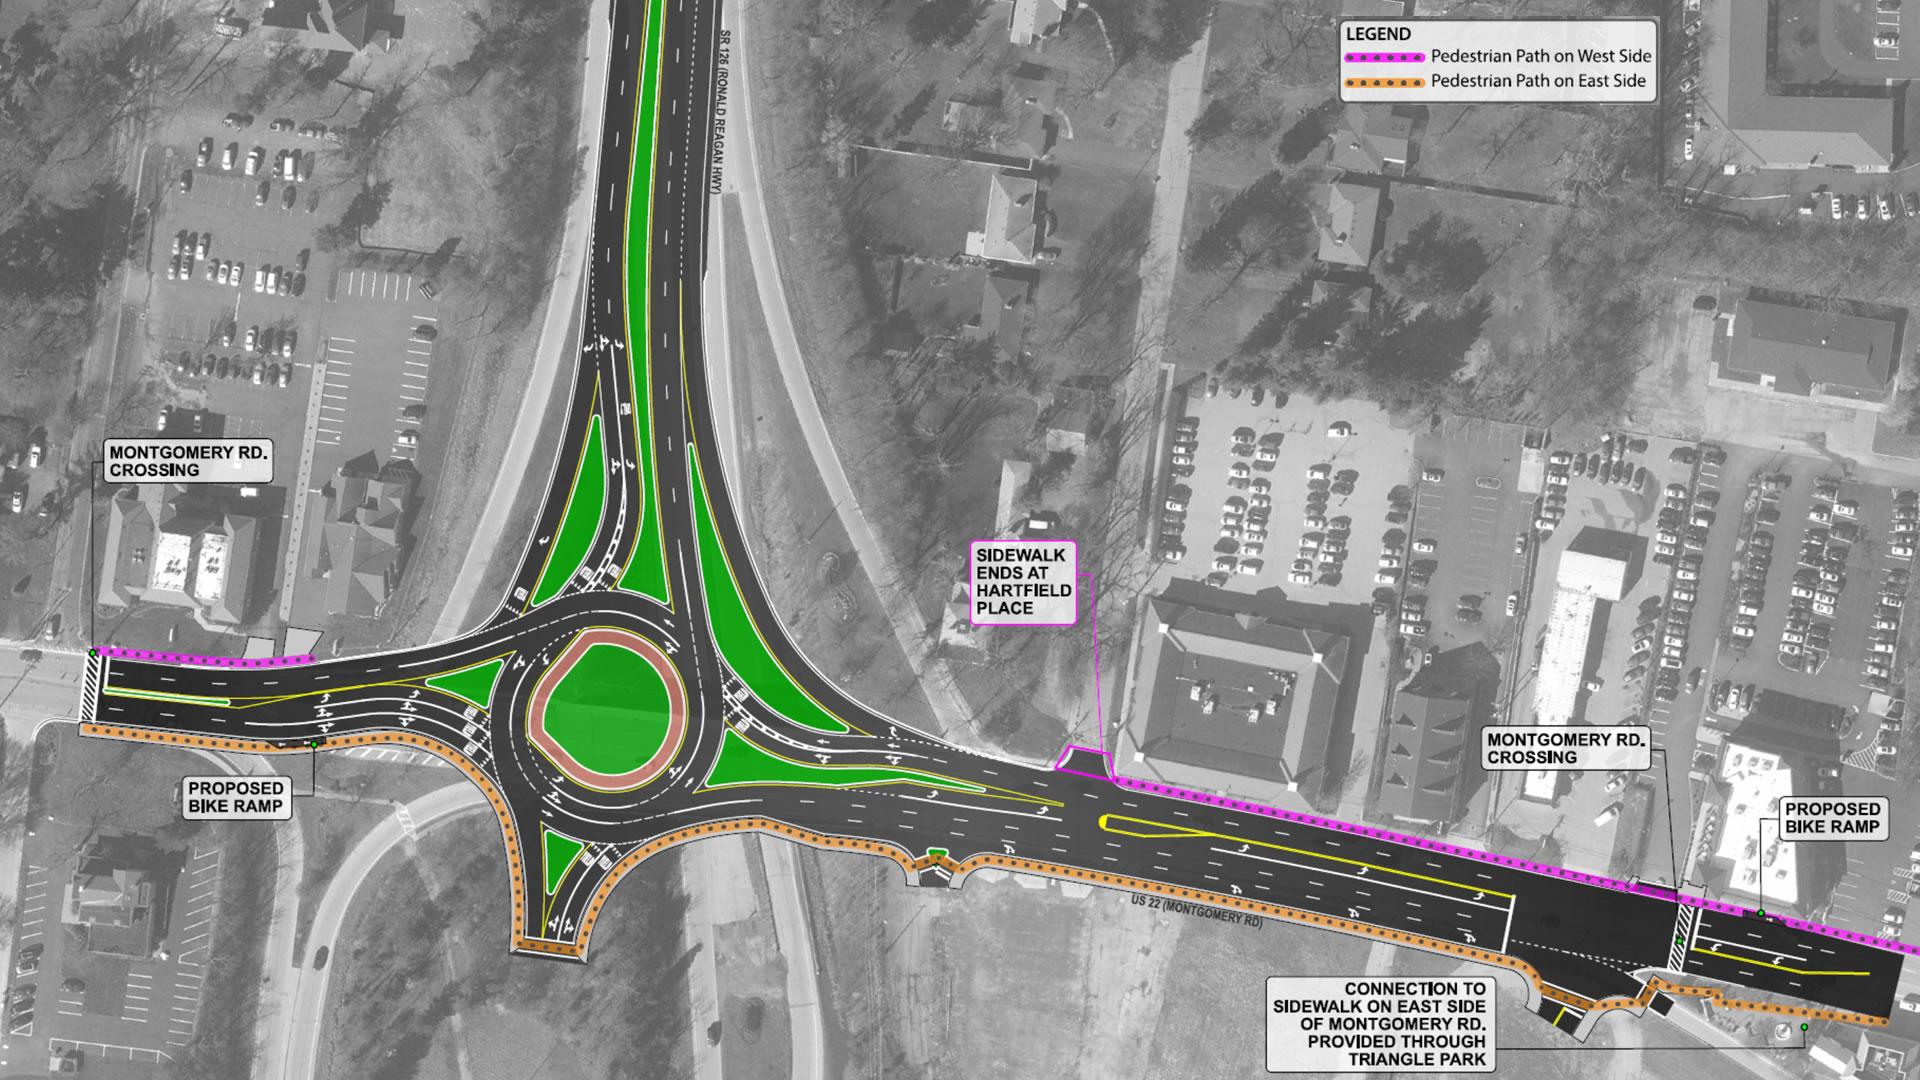 Roundabout Pedestrian Routes